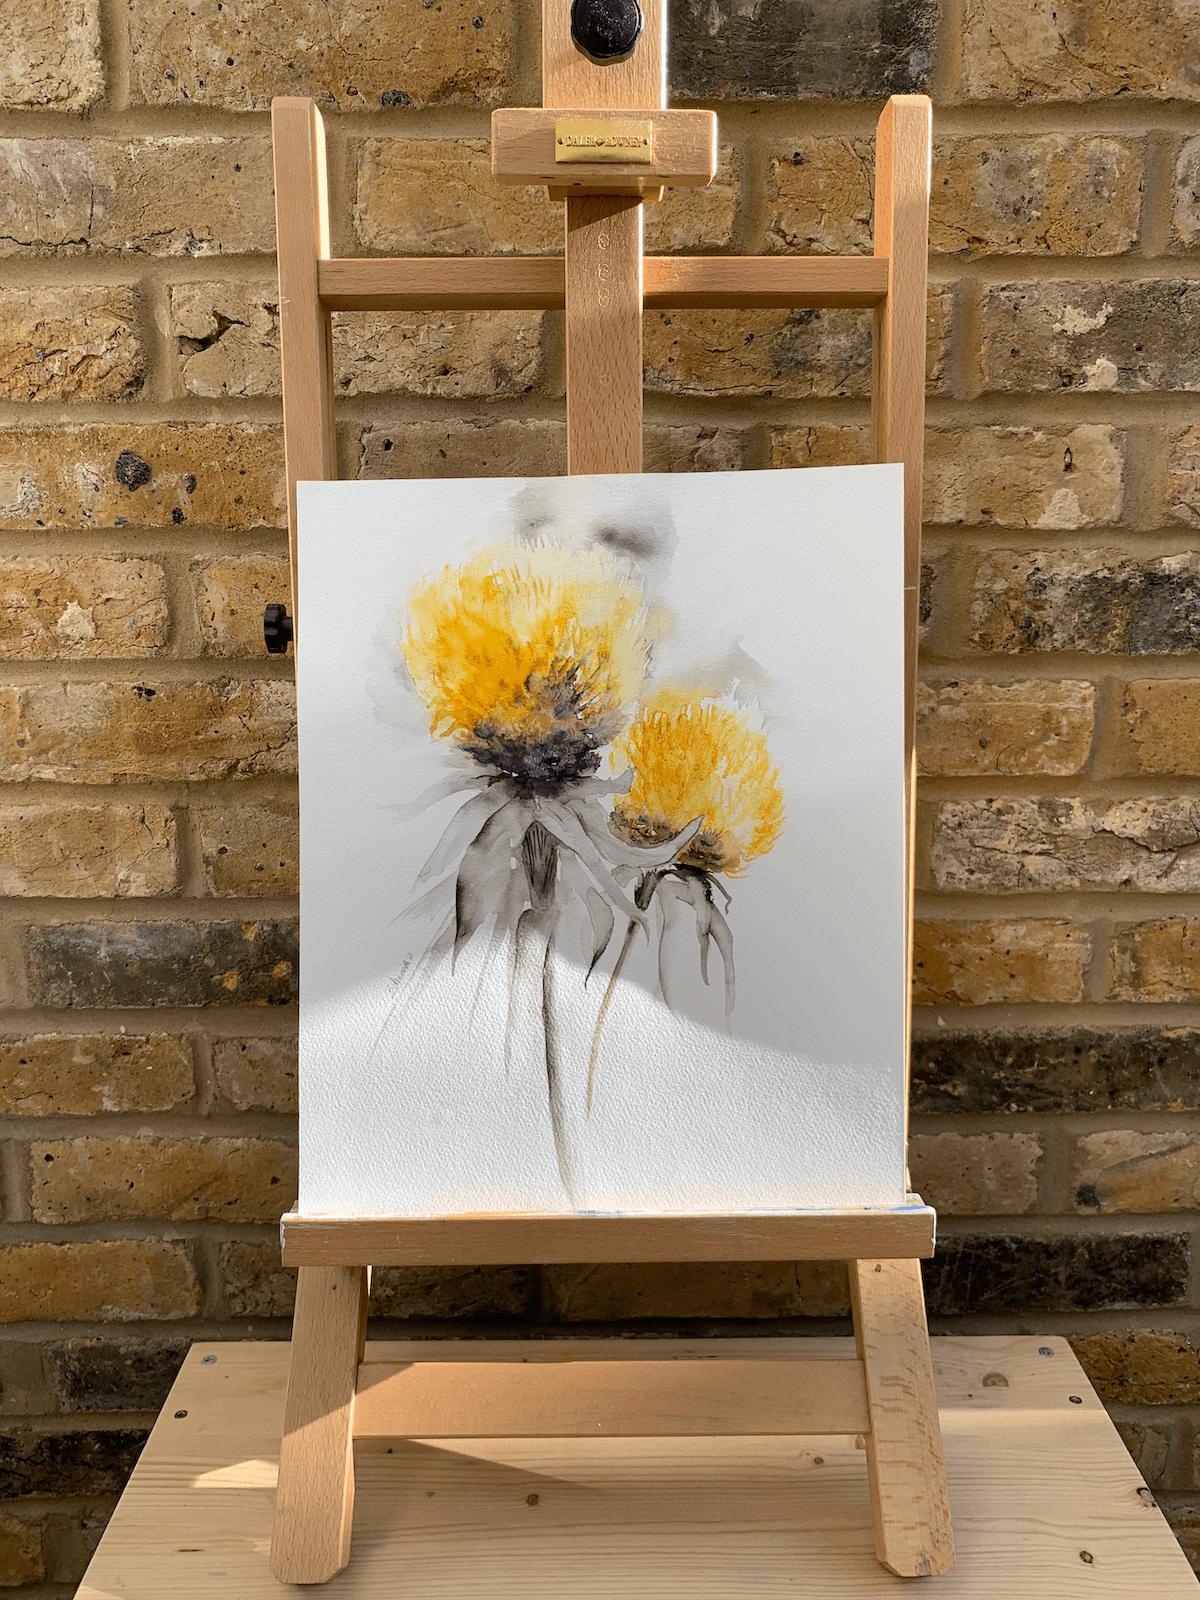 Lemon Fluff by Zuzana Edwards, Floral contemporary watercolour art 11.5 x 13.5 (28.5 x 35 cm).